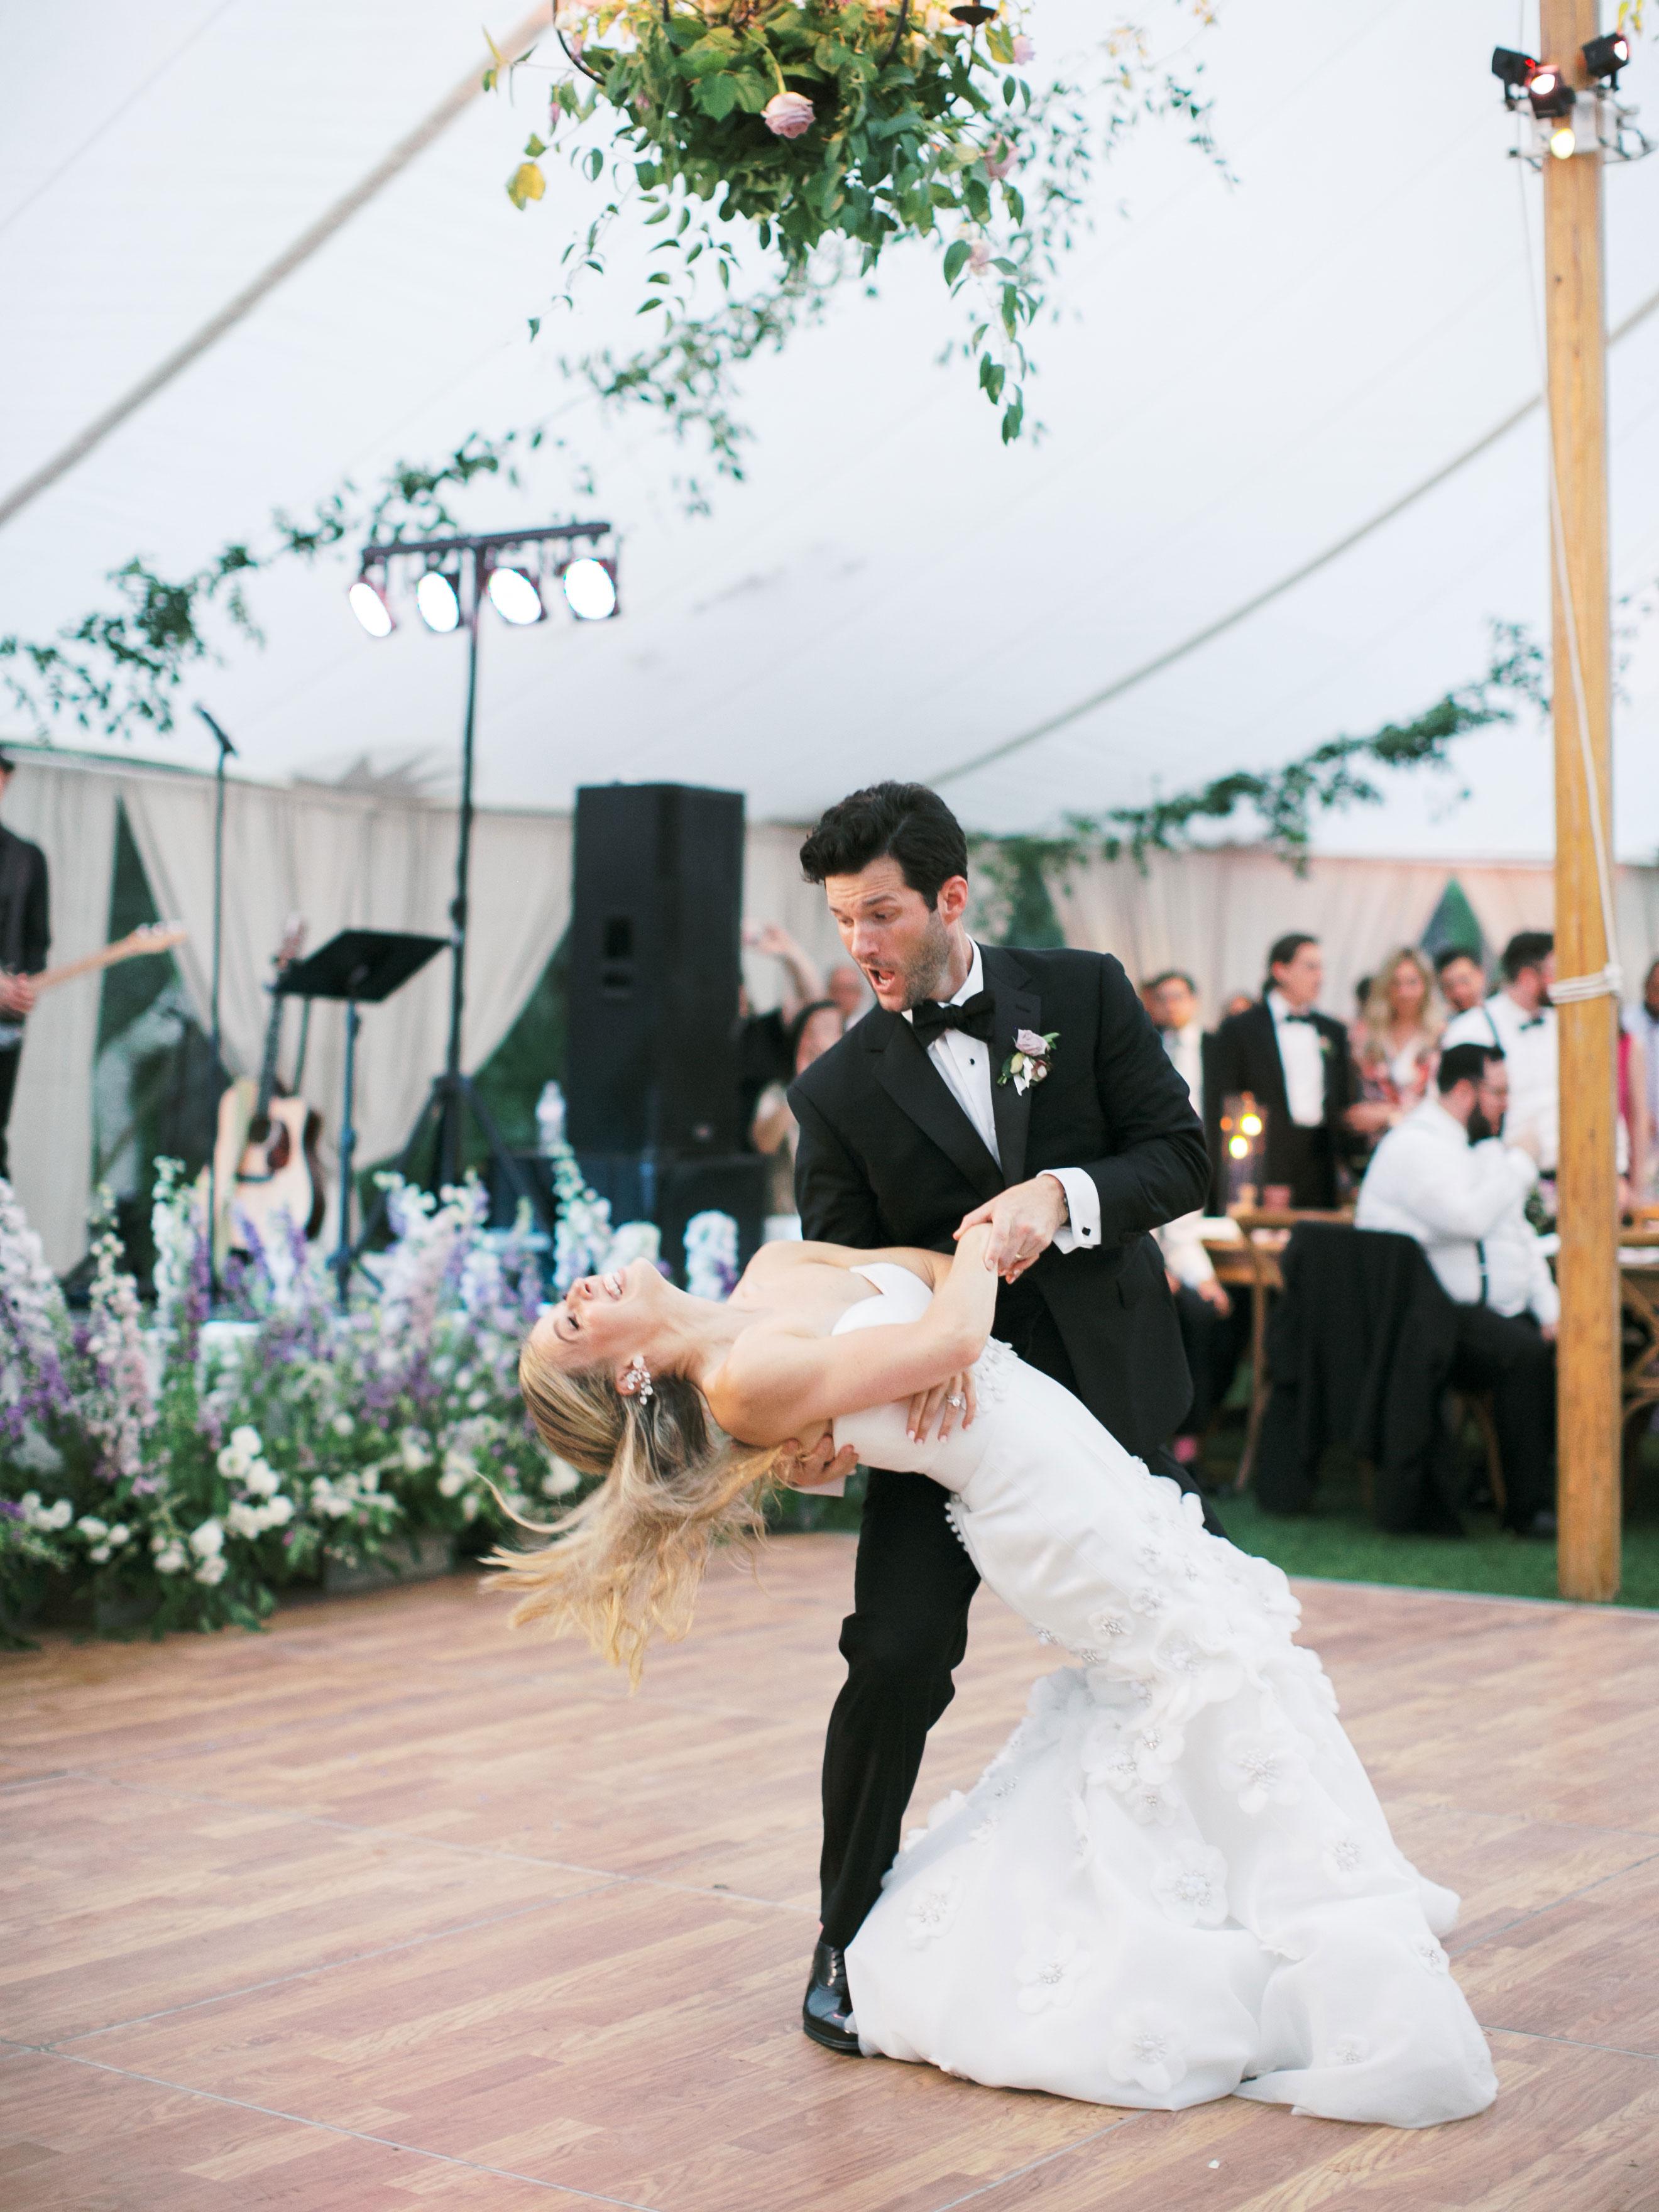 leighton craig wedding first dance dip